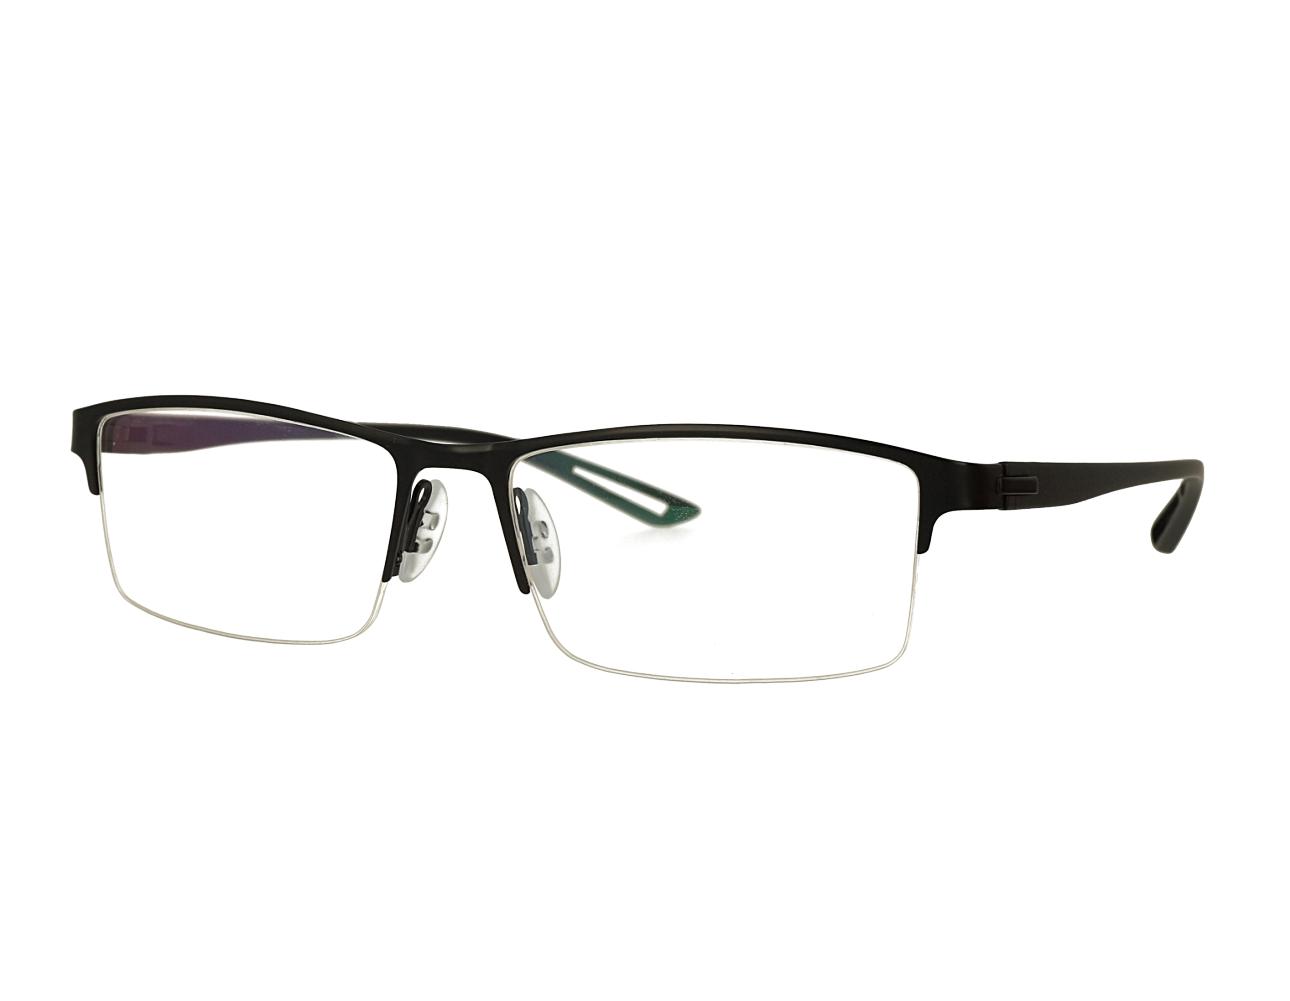 Half rim Mans designer metal eyewear with TR90 temples